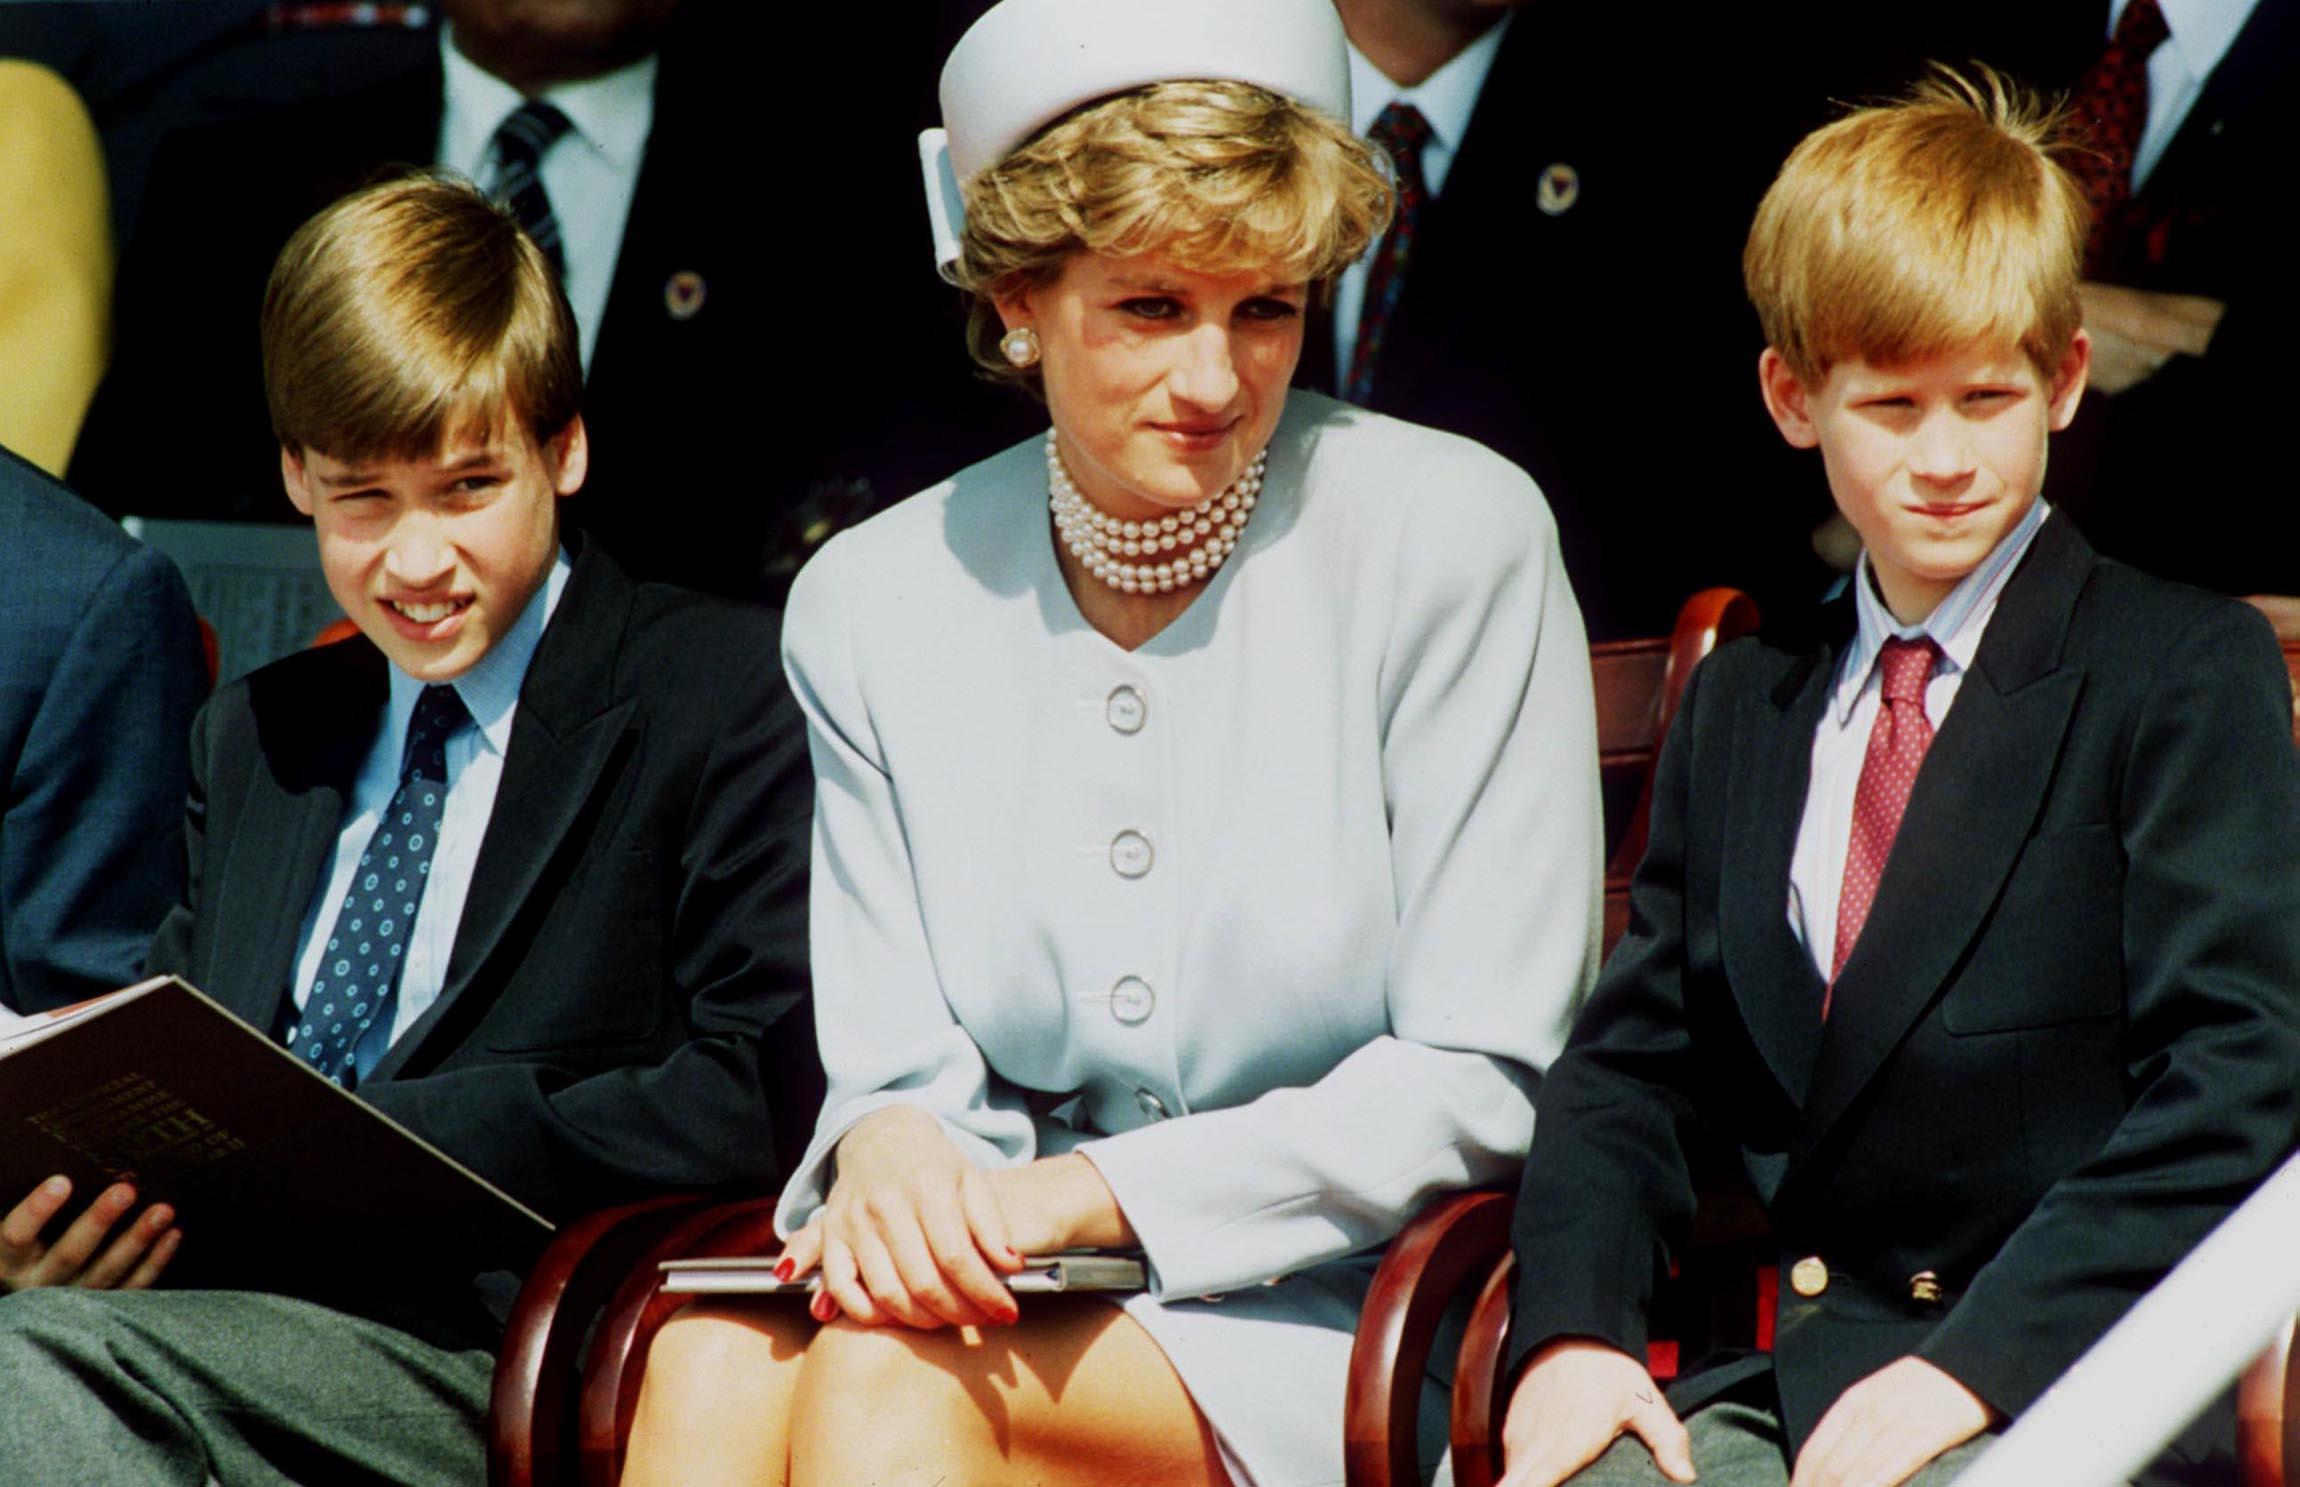 Prince William Prince Harry Princess Diana Getty Images